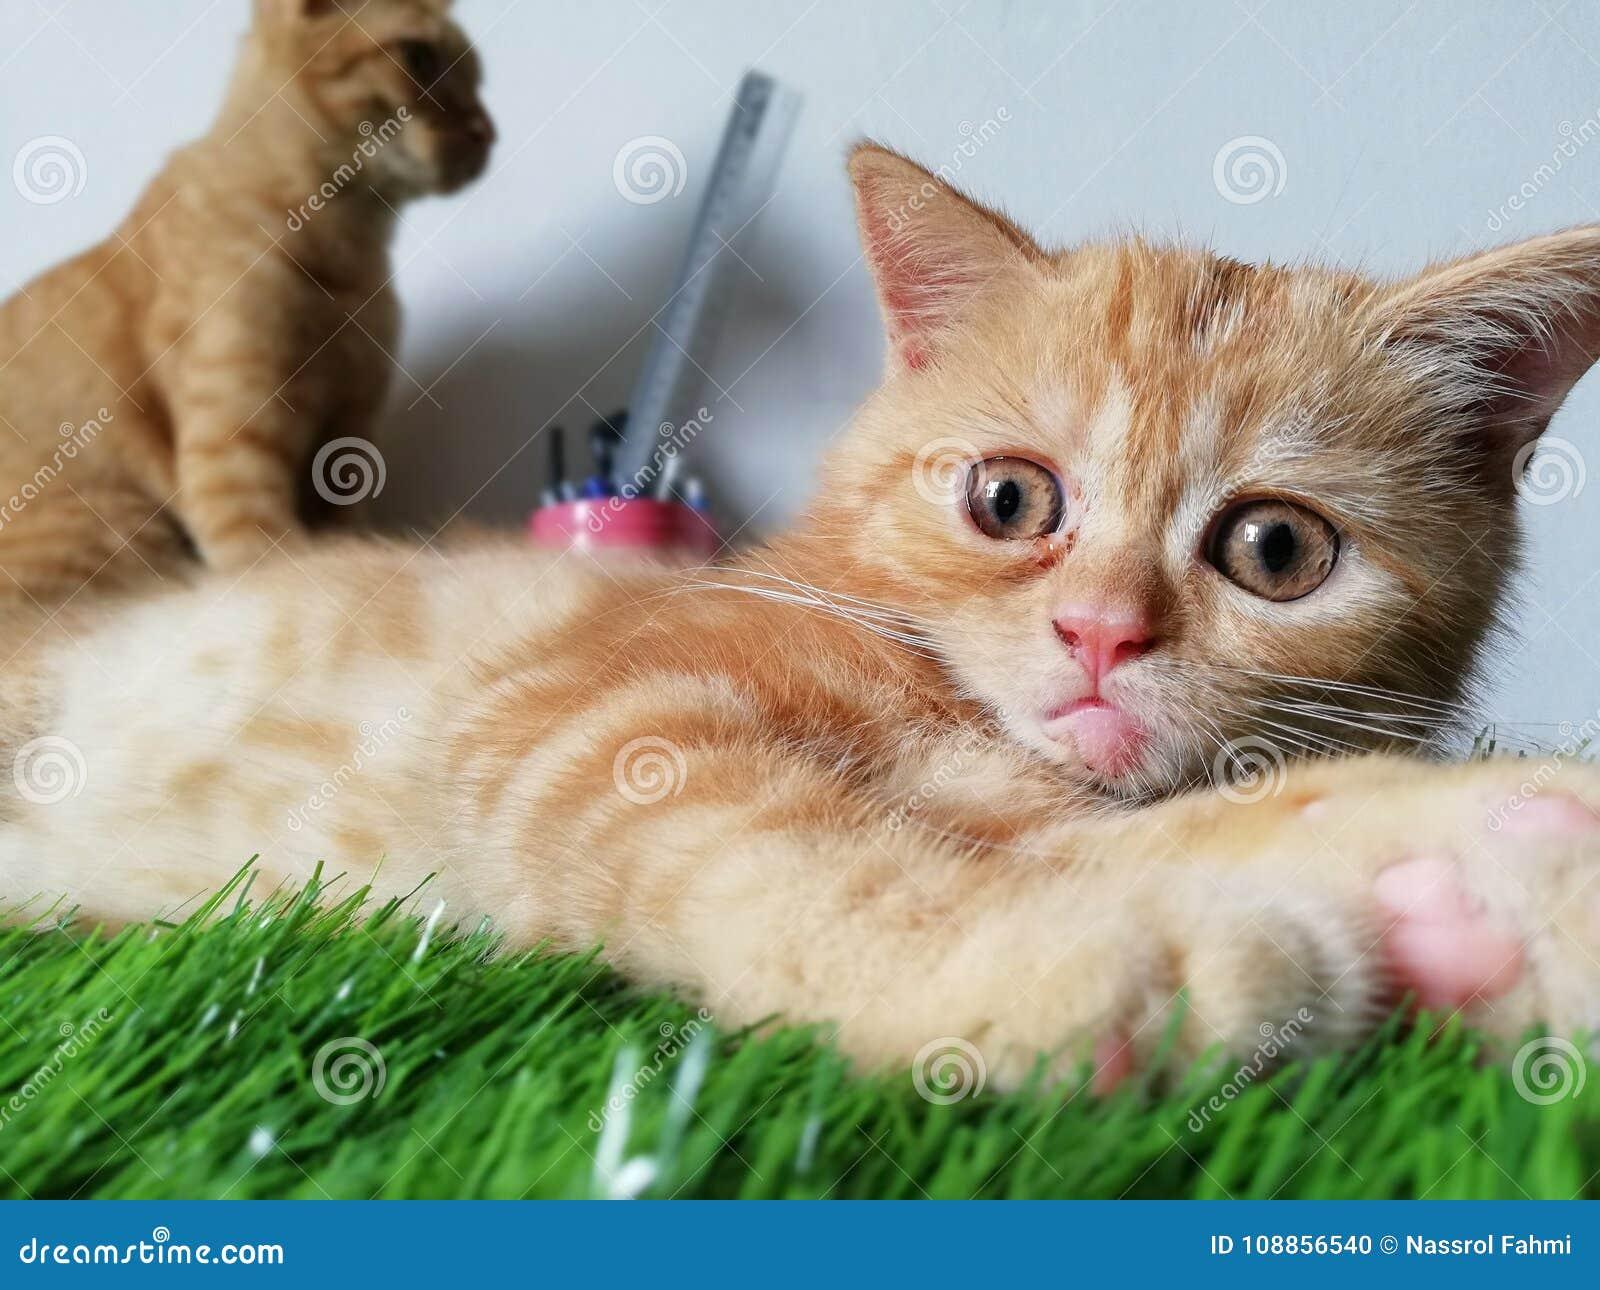 d30aa49a6067 Η Dora είναι μια βρετανική κοντή τιγρέ γάτα τρίχας που έχει uniqur τη  έκφραση του προσώπου